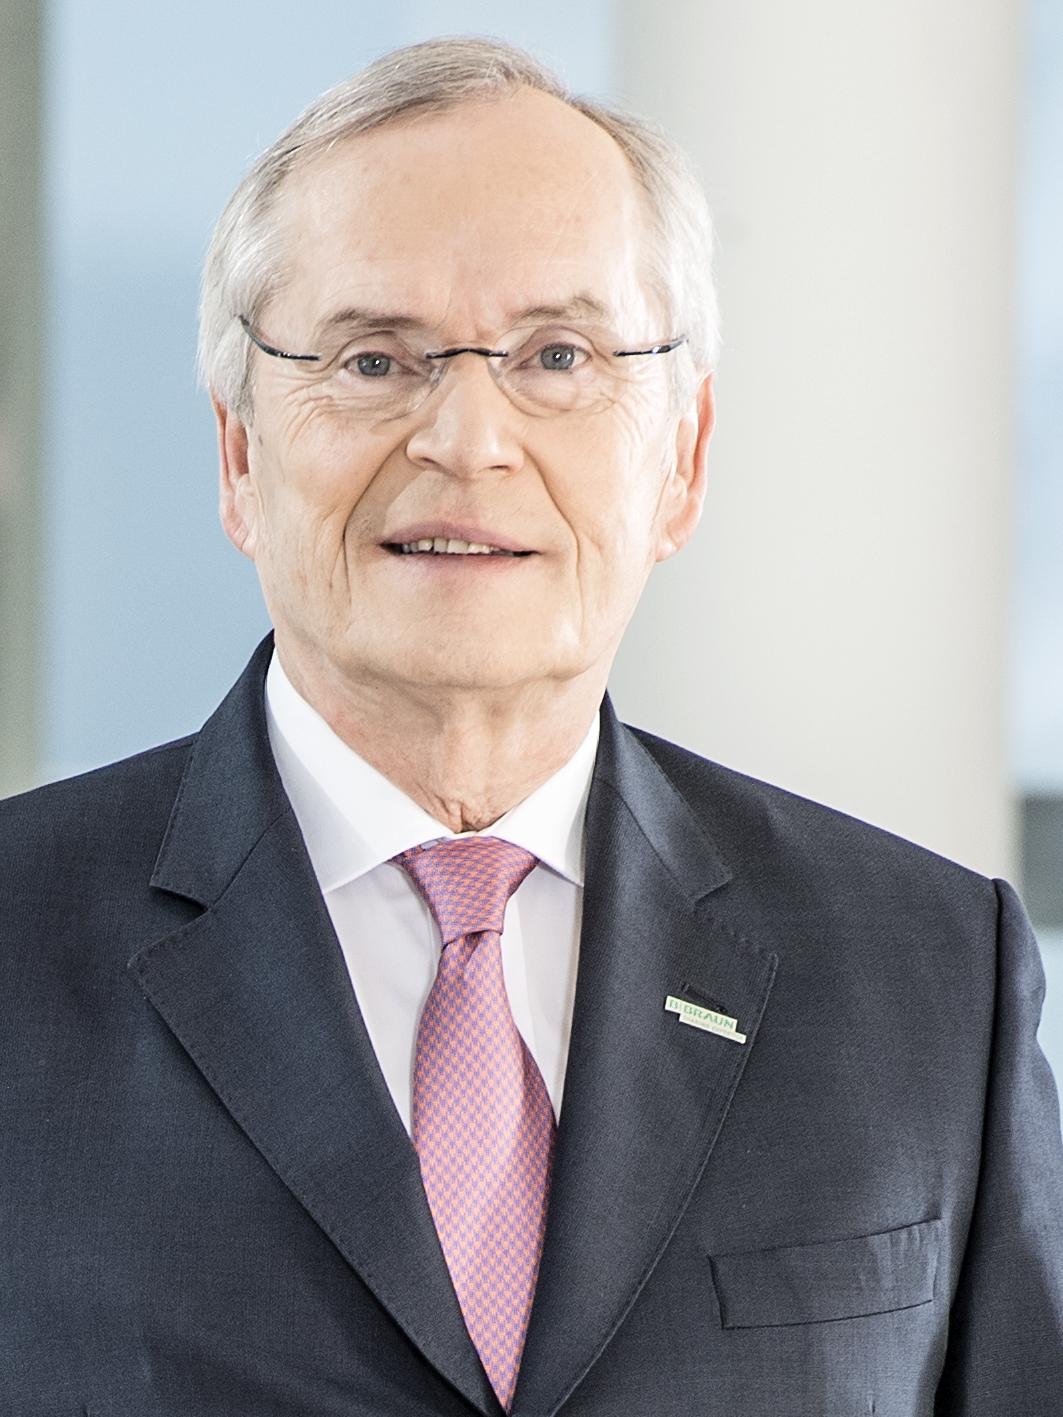 2018_Prof_Heinz-Walter_Große_0337.jpg